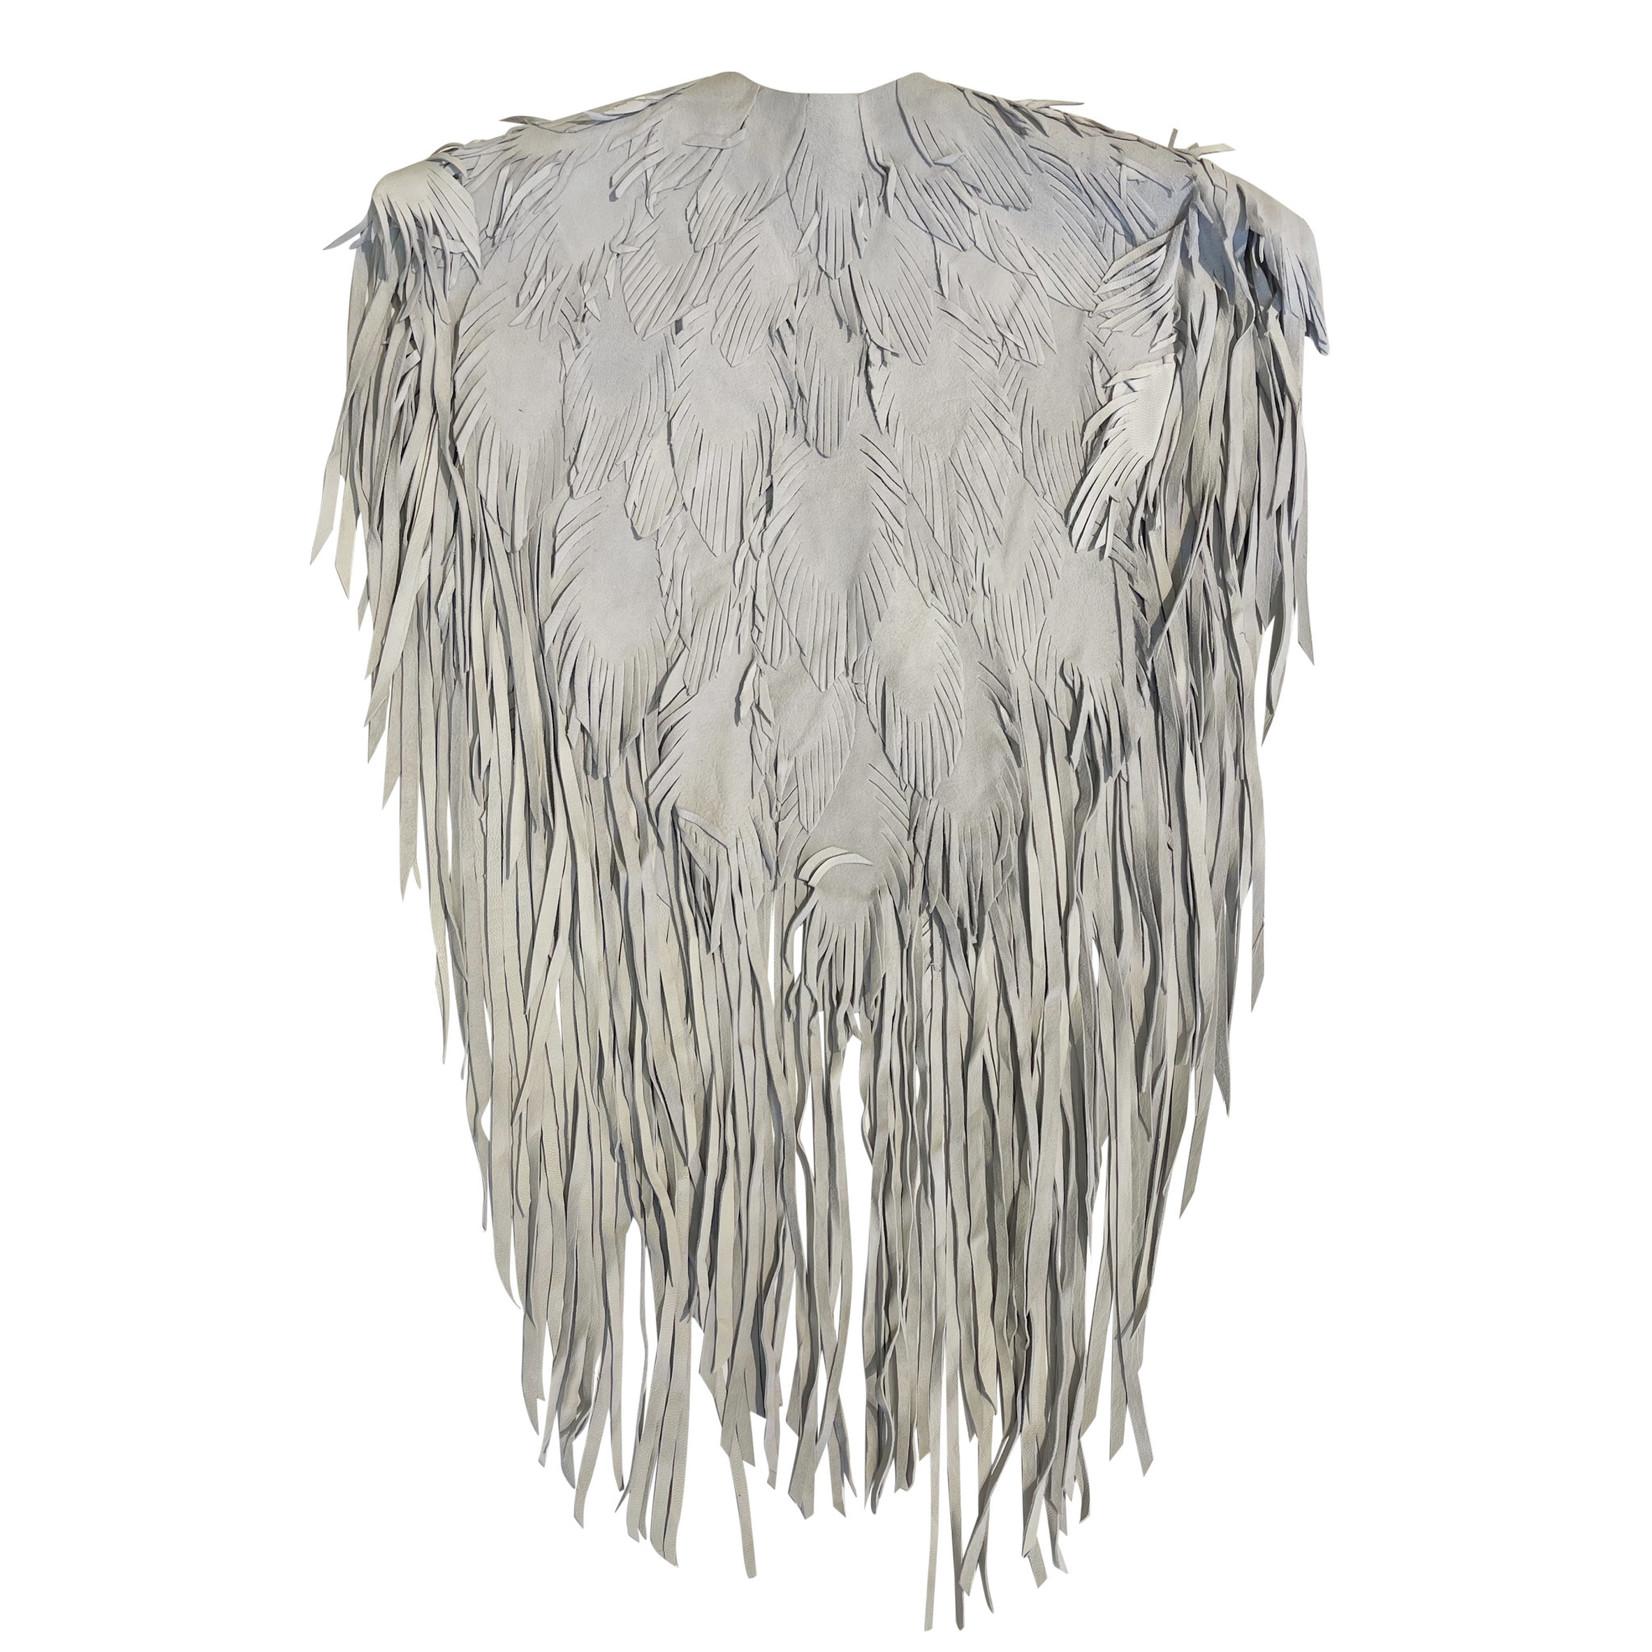 Wyld Blue Vintage Suede Feather Cape (Vintage)